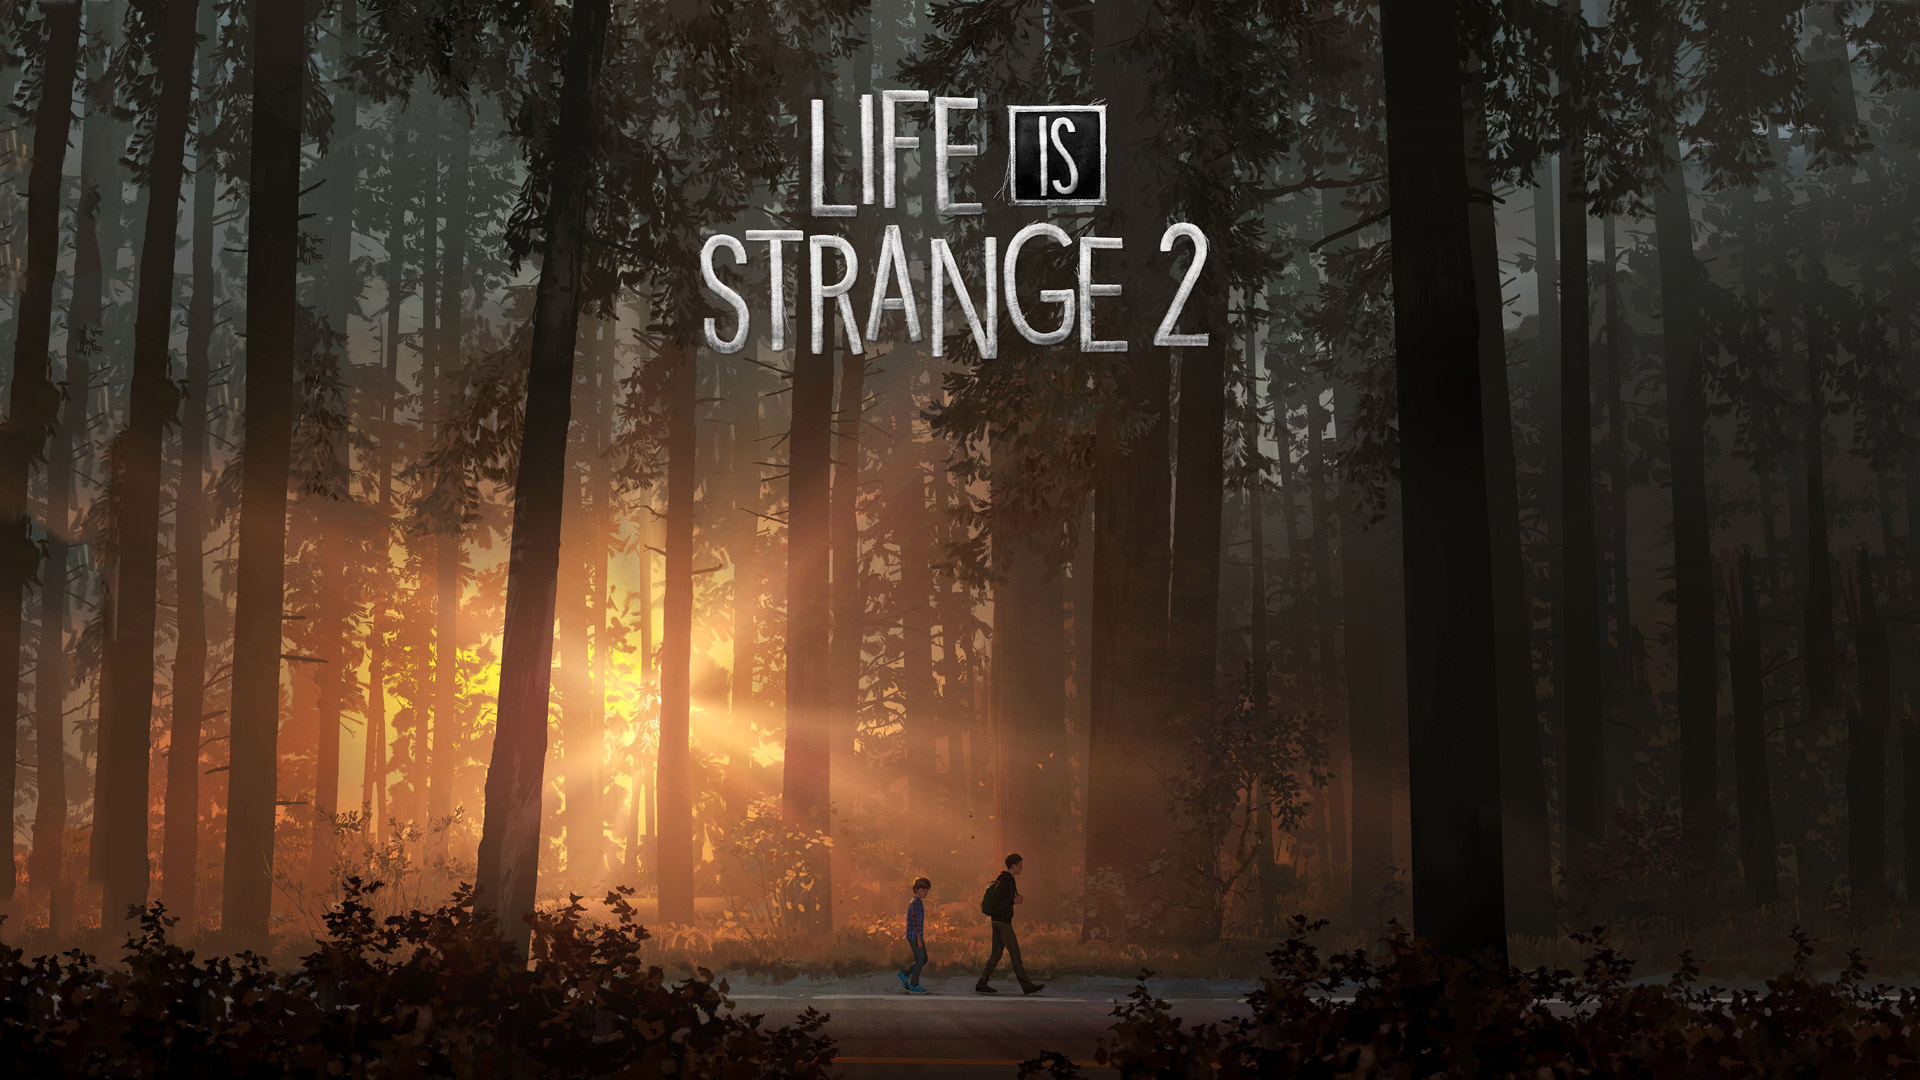 Free Life is Strange 2 Wallpaper in 1920x1080